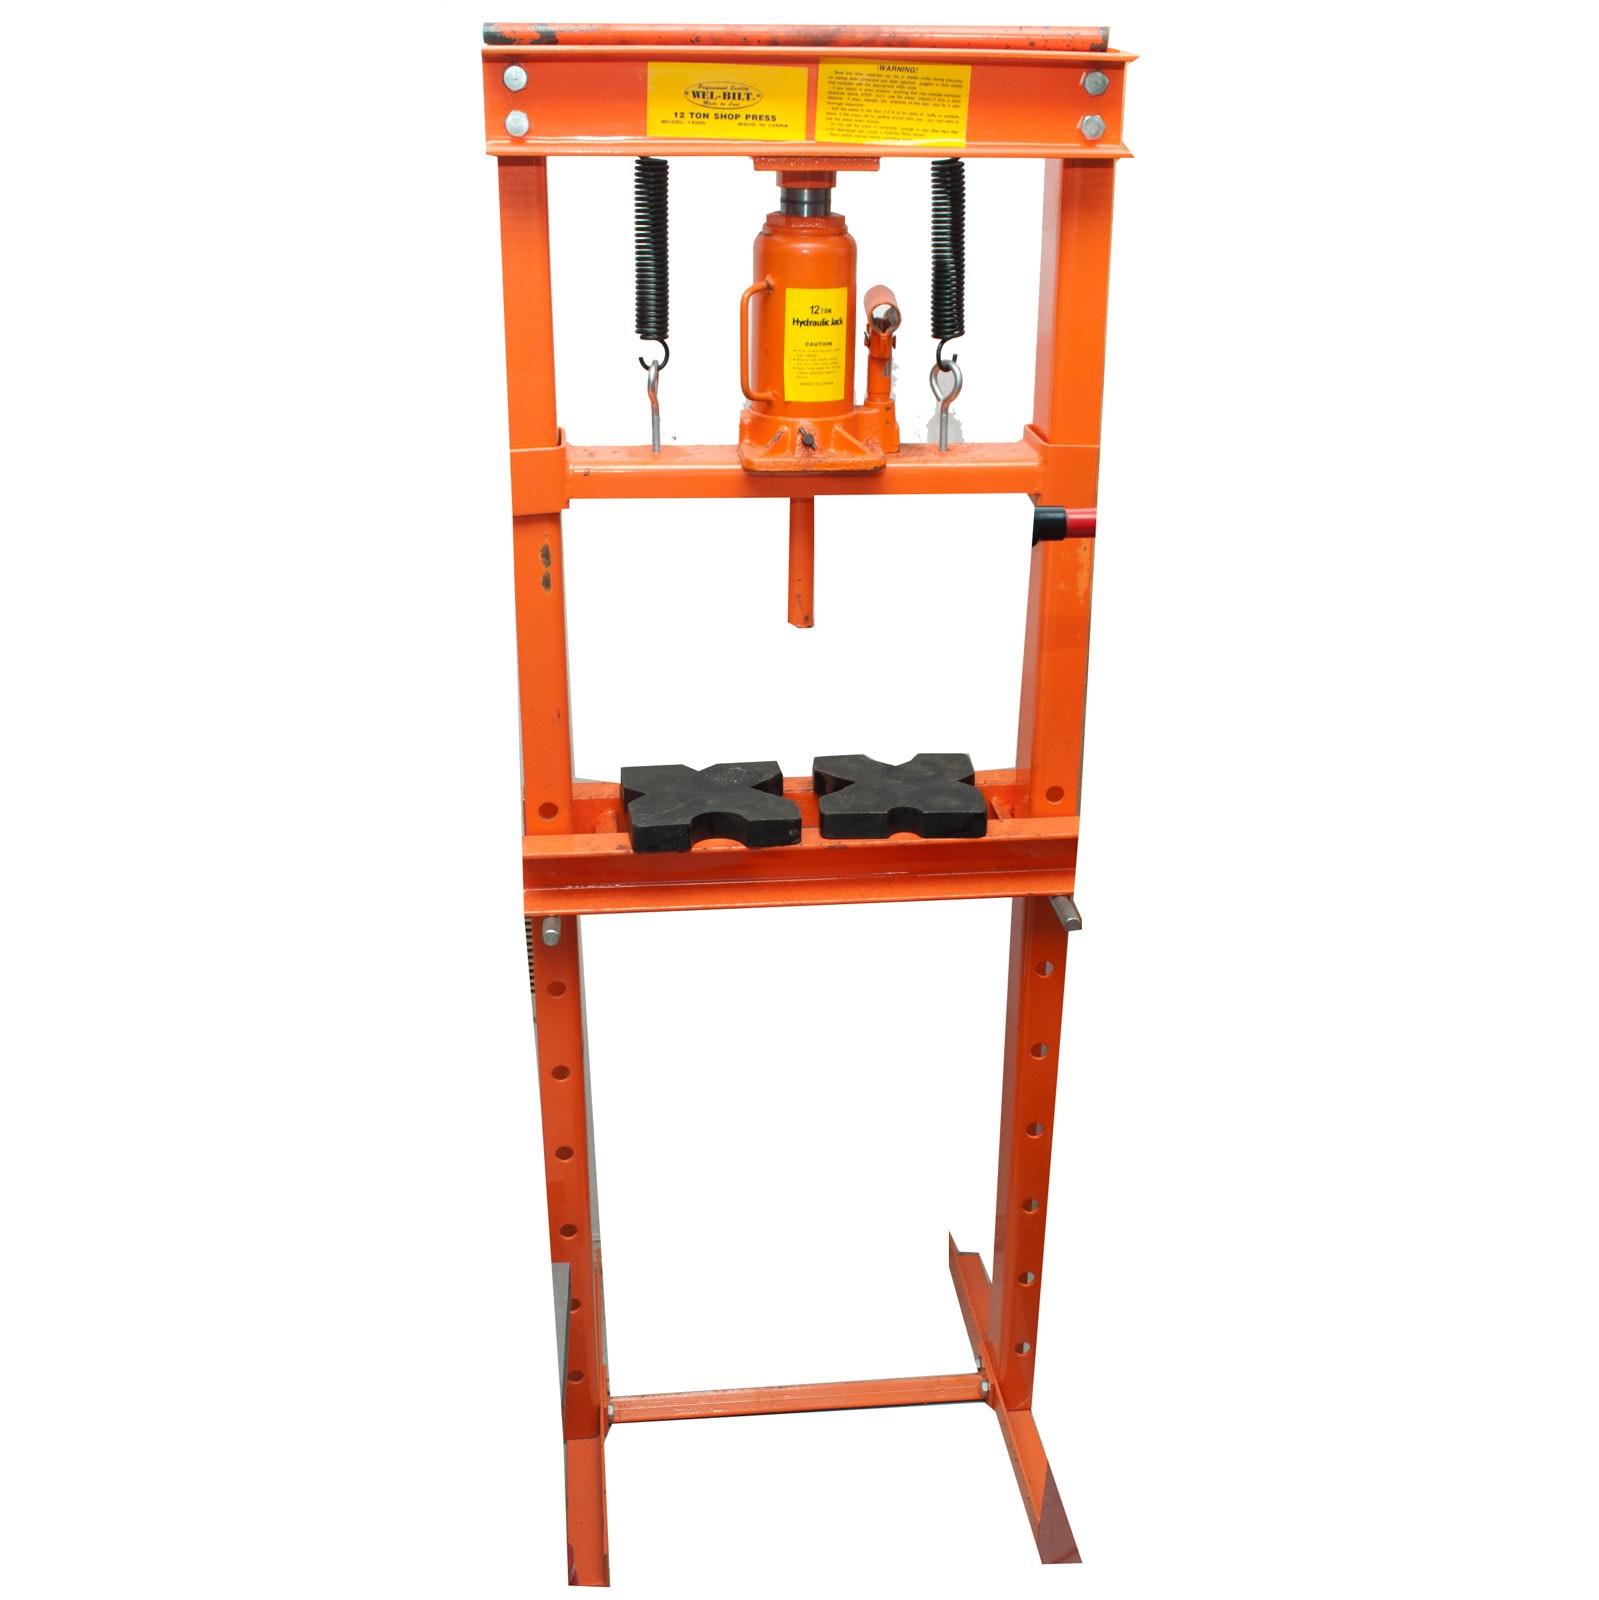 Wel-Bilt H-Style 12-Ton Shop Press